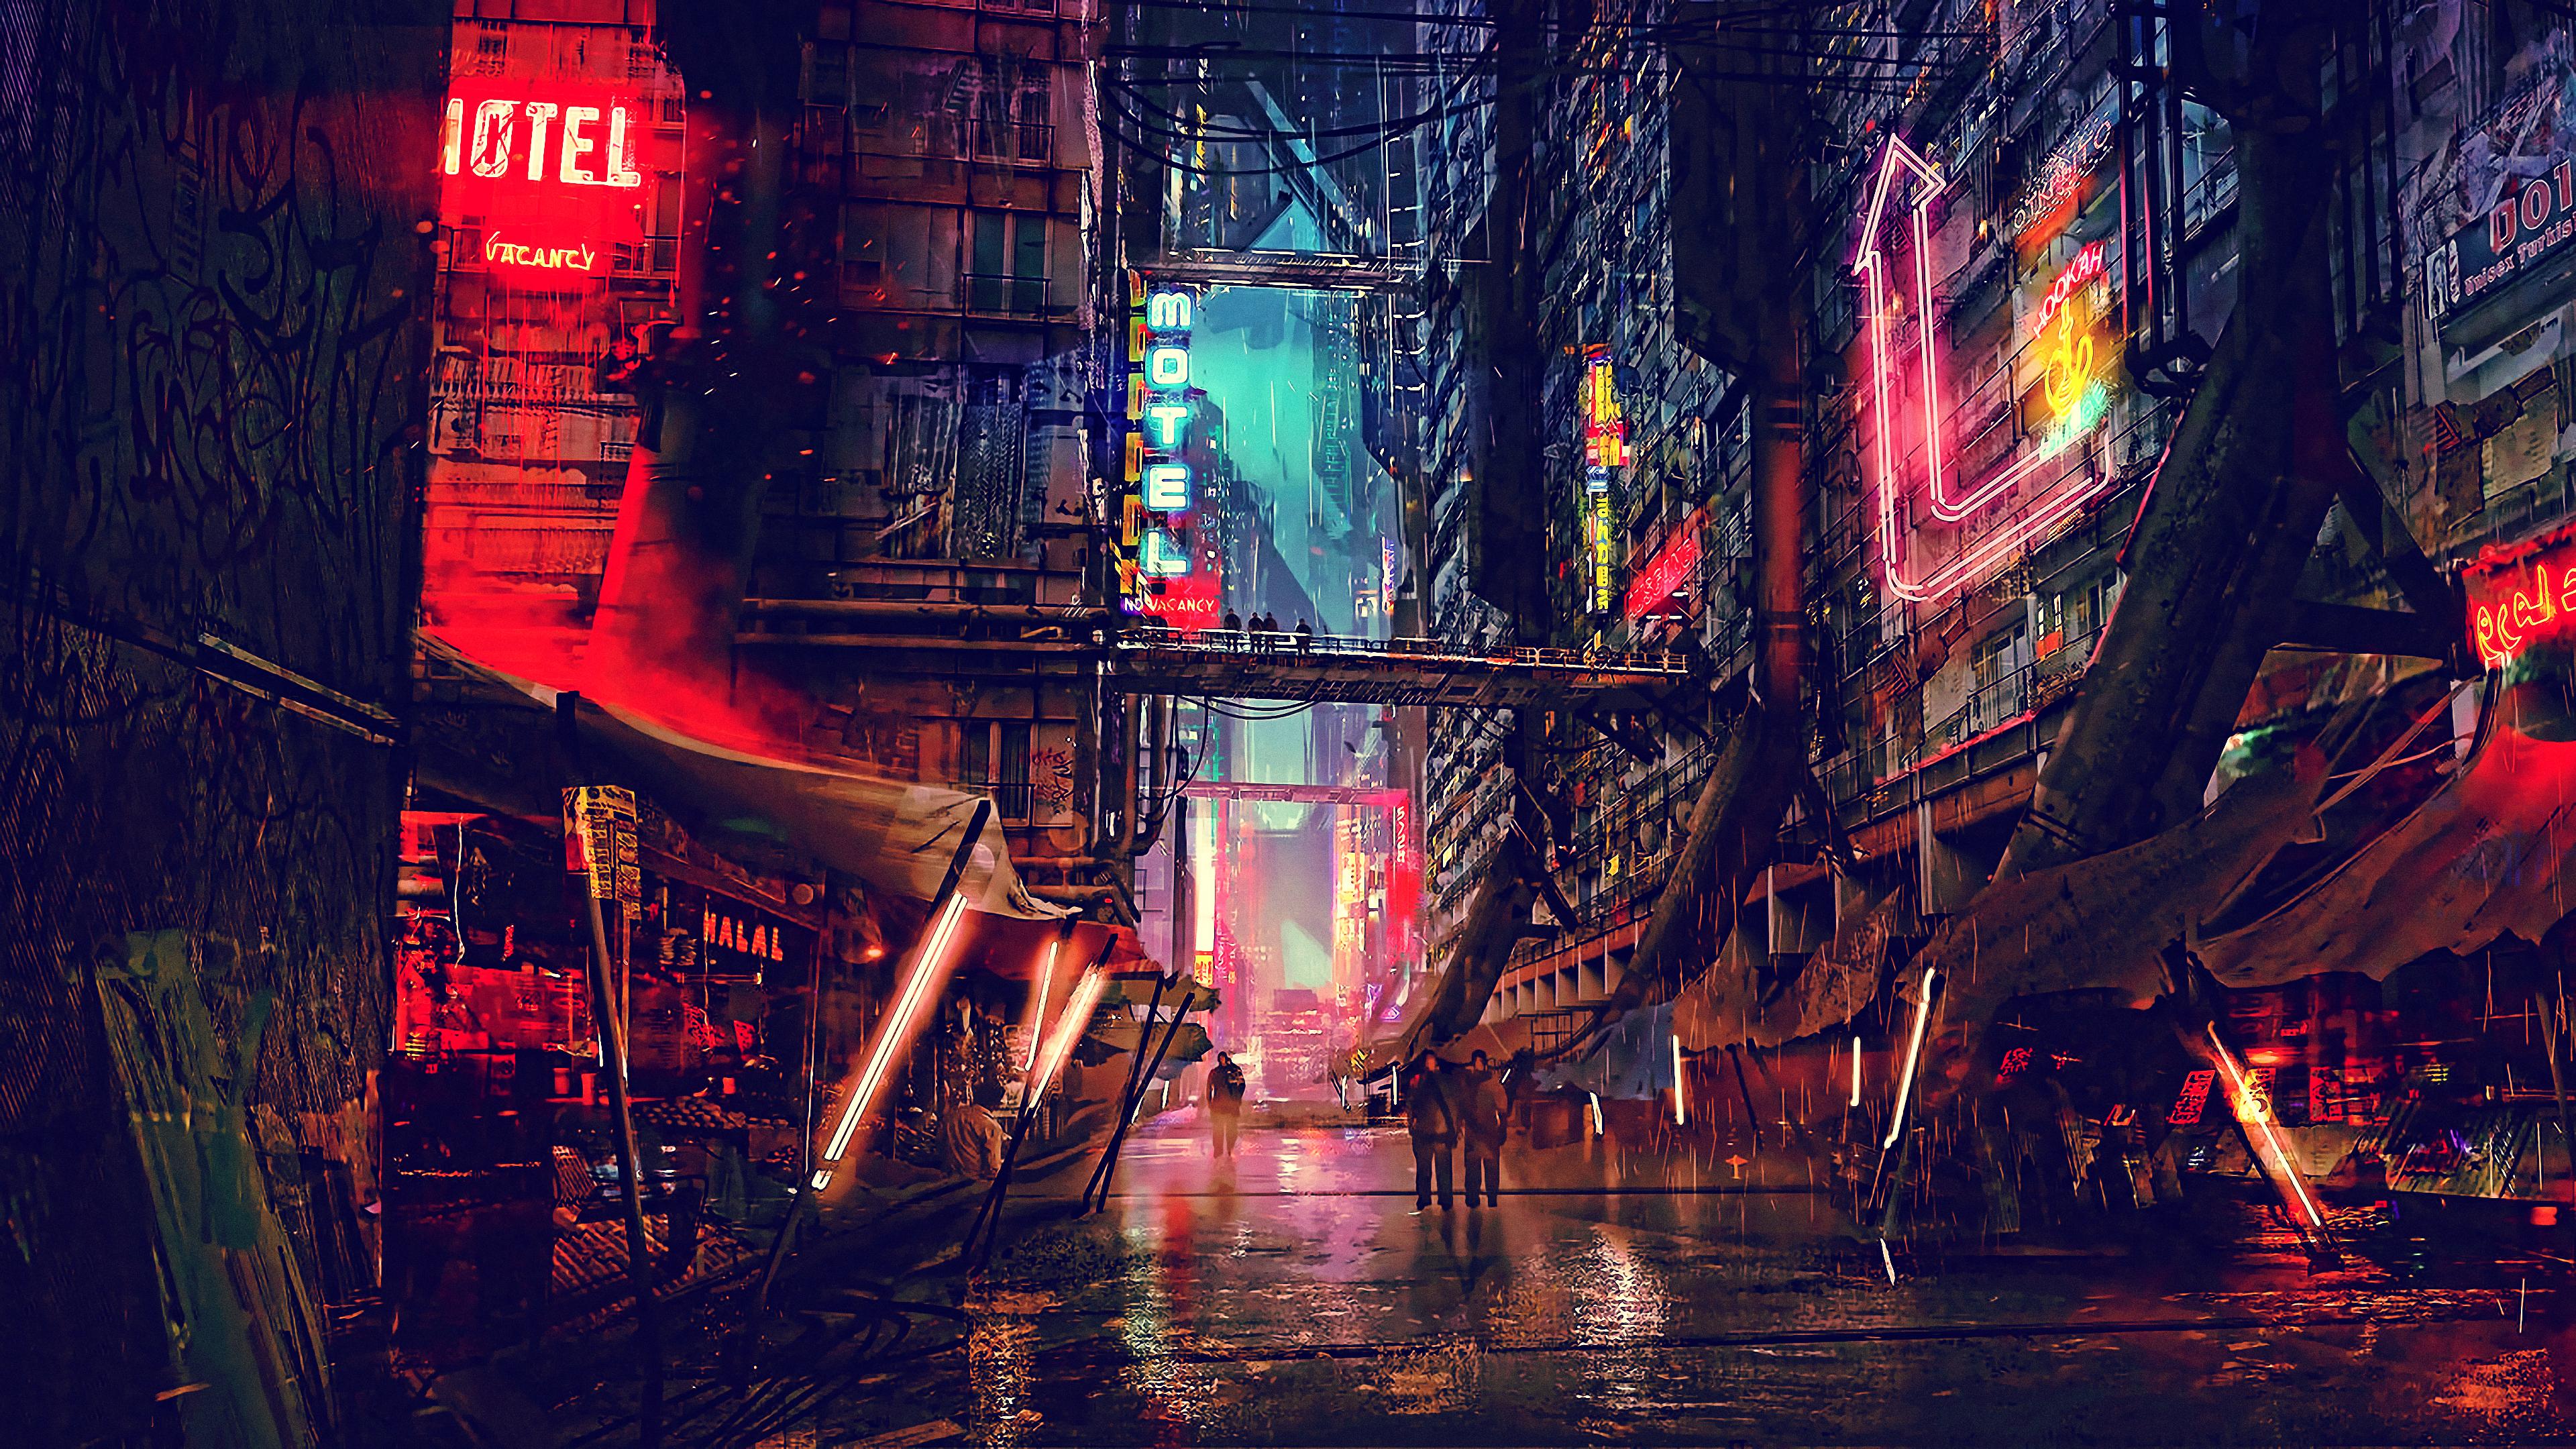 Futuristic City Wallpaper Hd: Science Fiction Cyberpunk Futuristic City Digital Art 4k